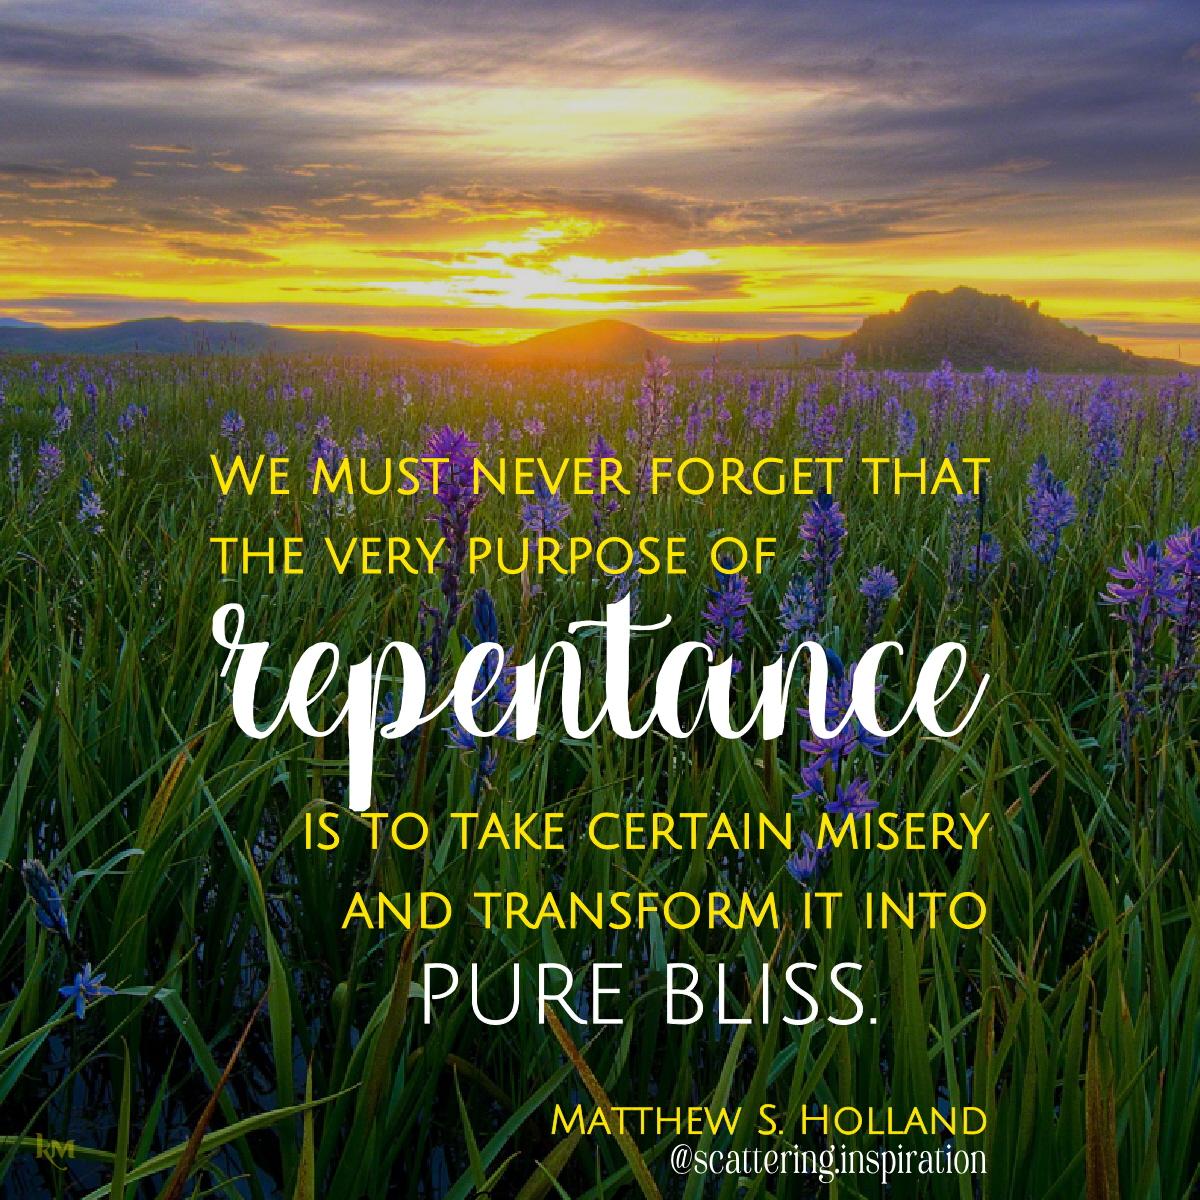 purpose of repentance